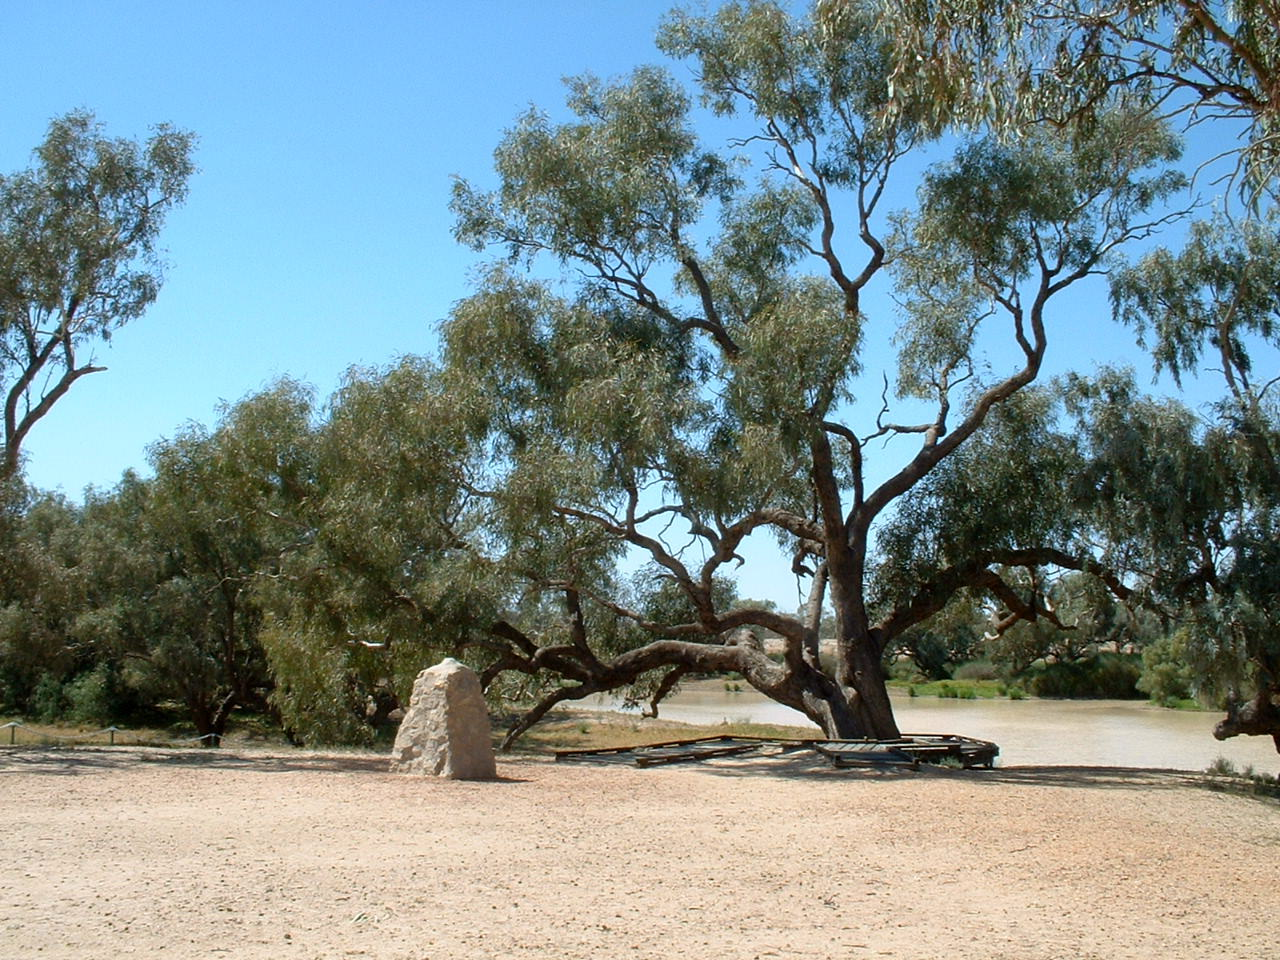 burke_and_wills_dig_tree_2.JPG